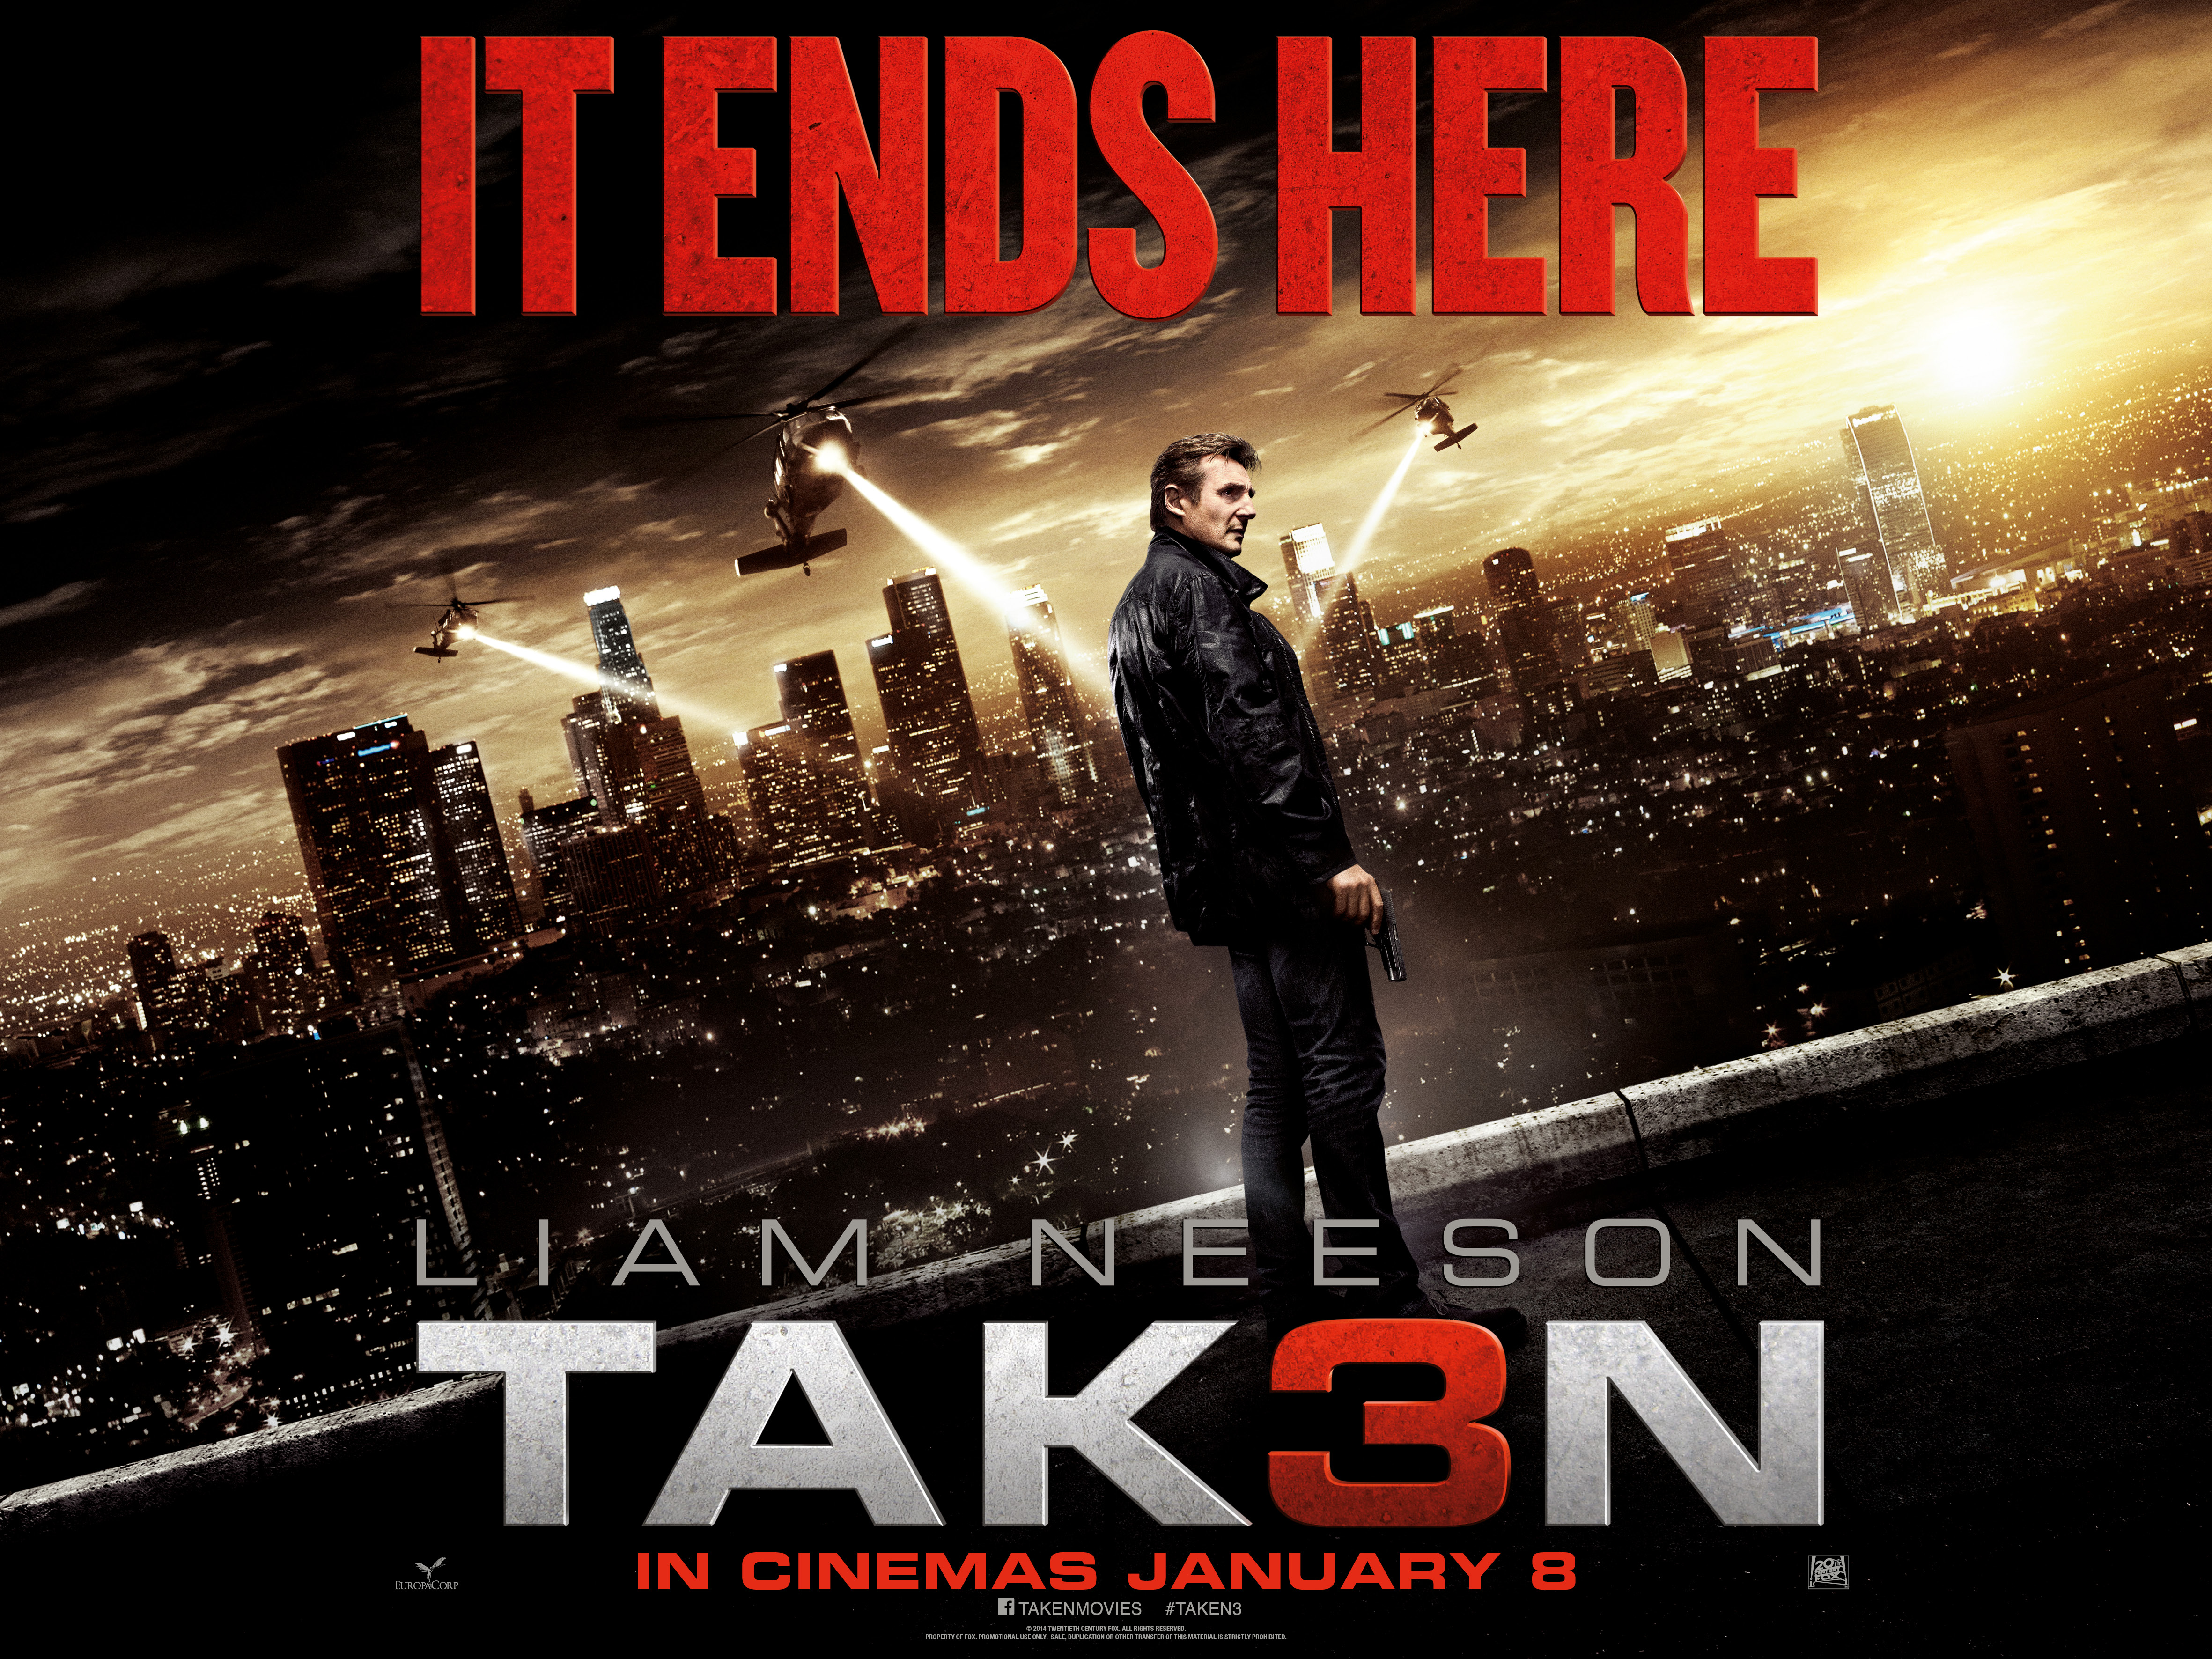 Image from liveforfilms.com